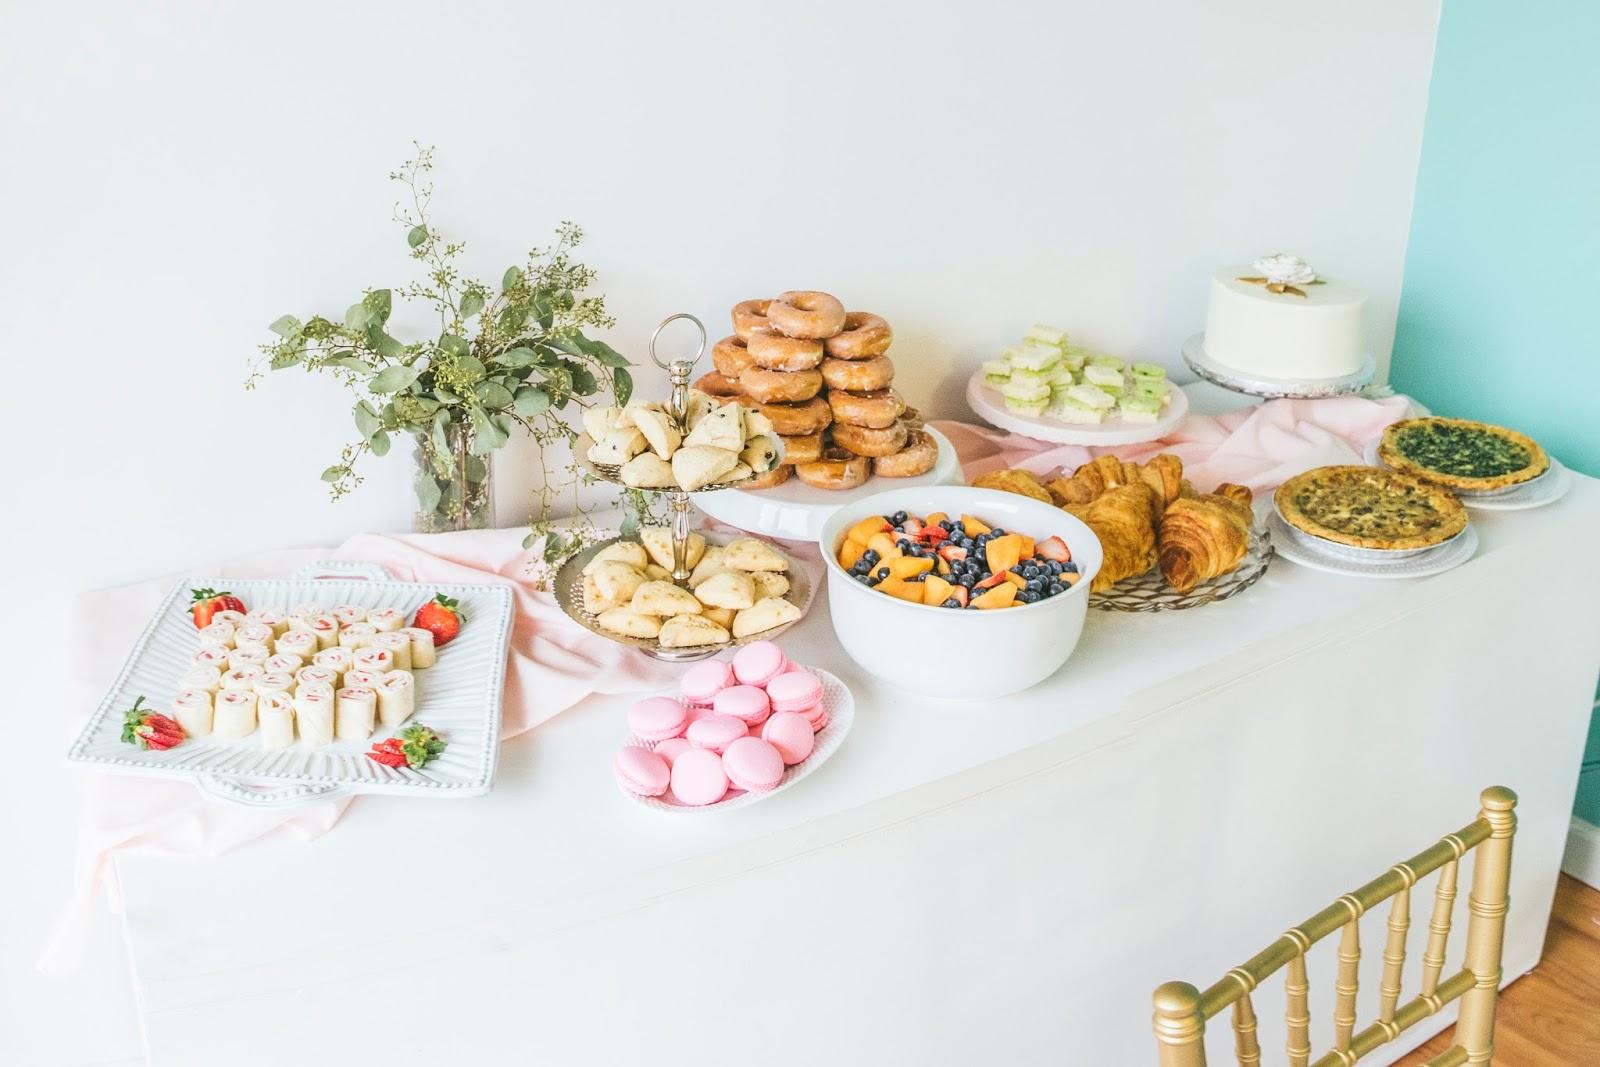 high-tea-valeintines-blogger-brunch-food-spread